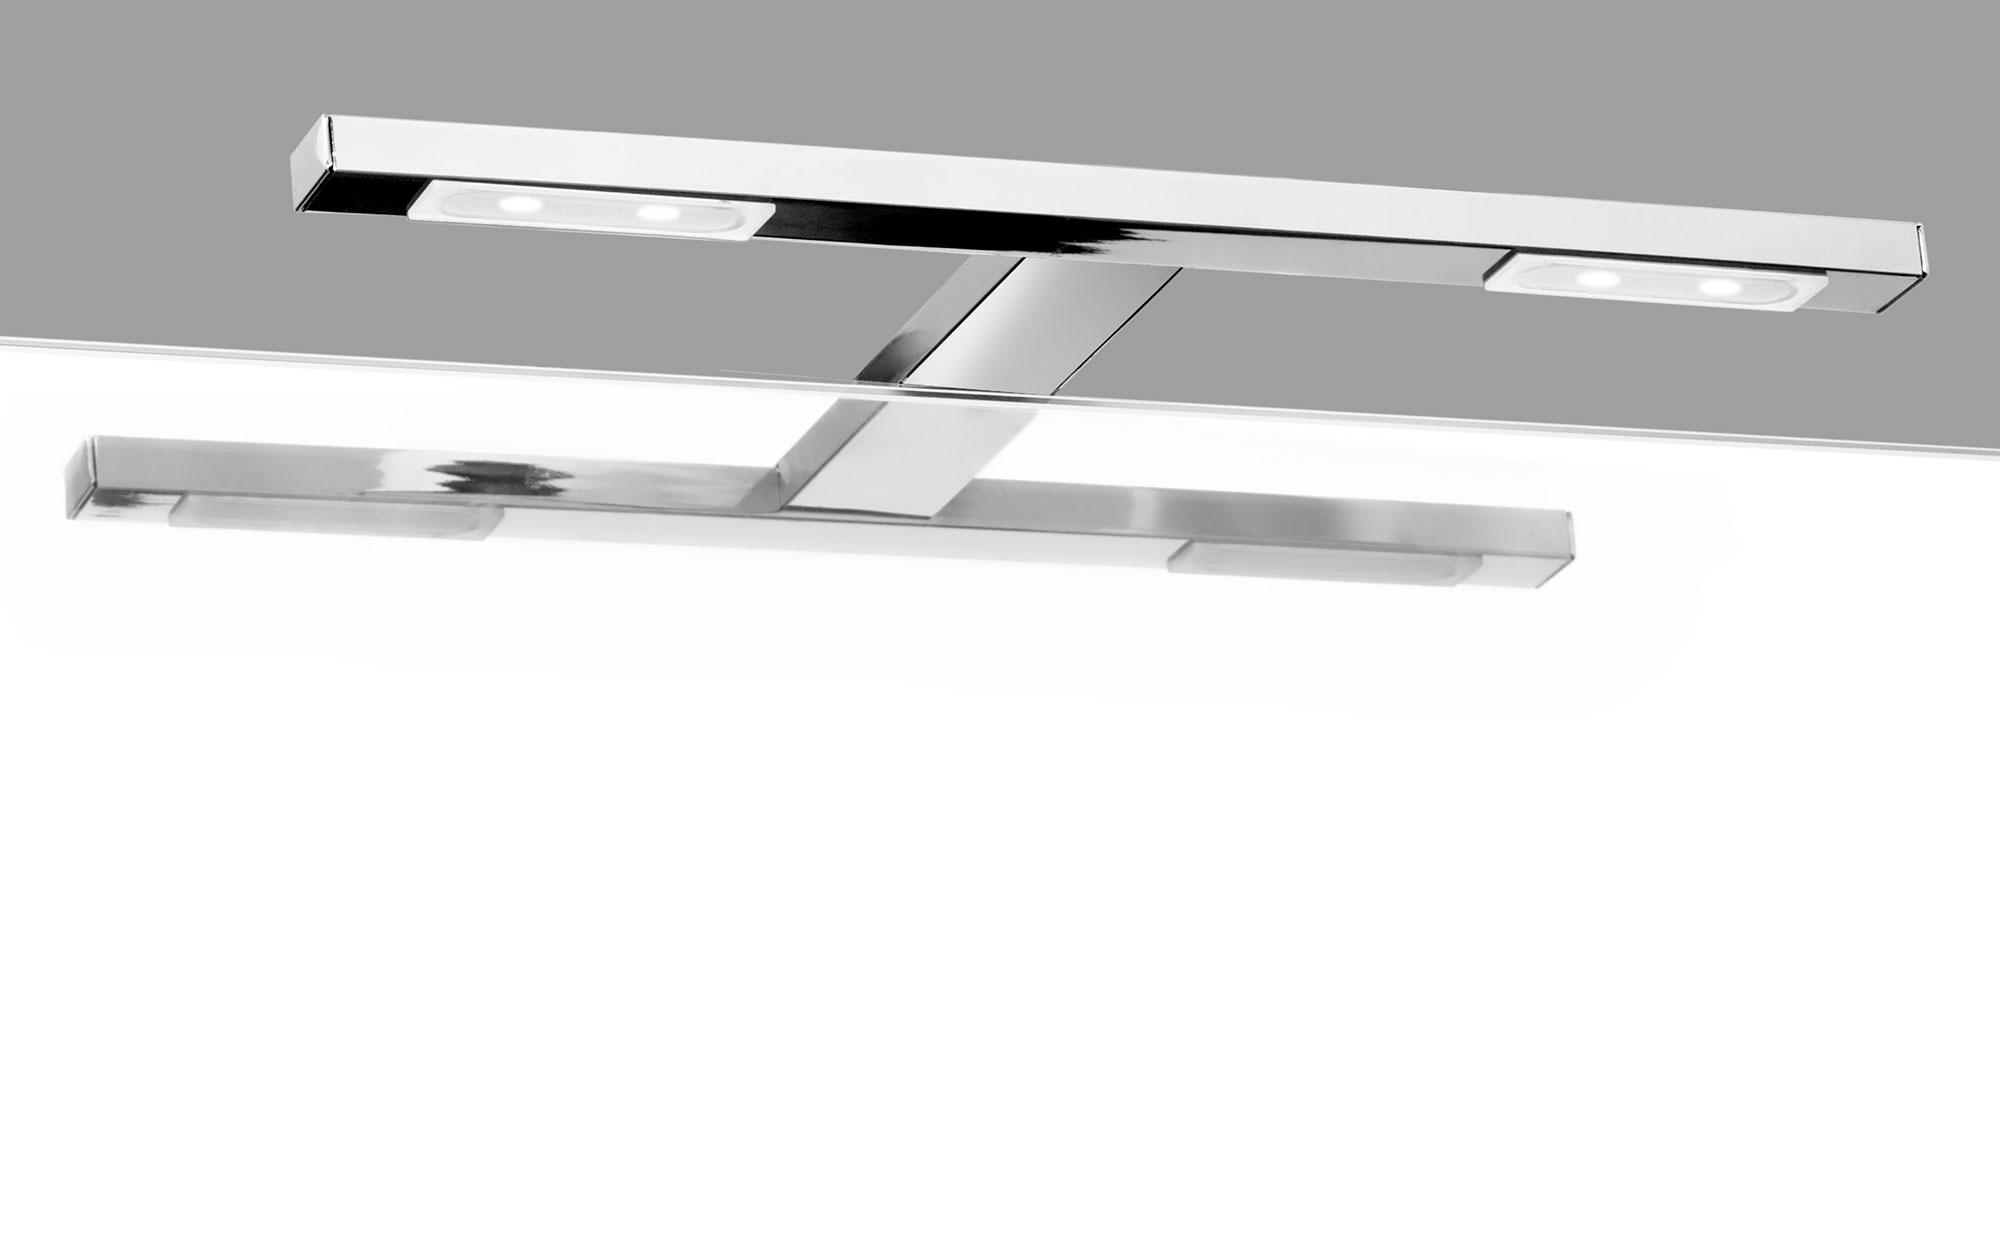 Mirror Info Salle de bain Design Ameublement de salle de bains Miroirs Ameublement de